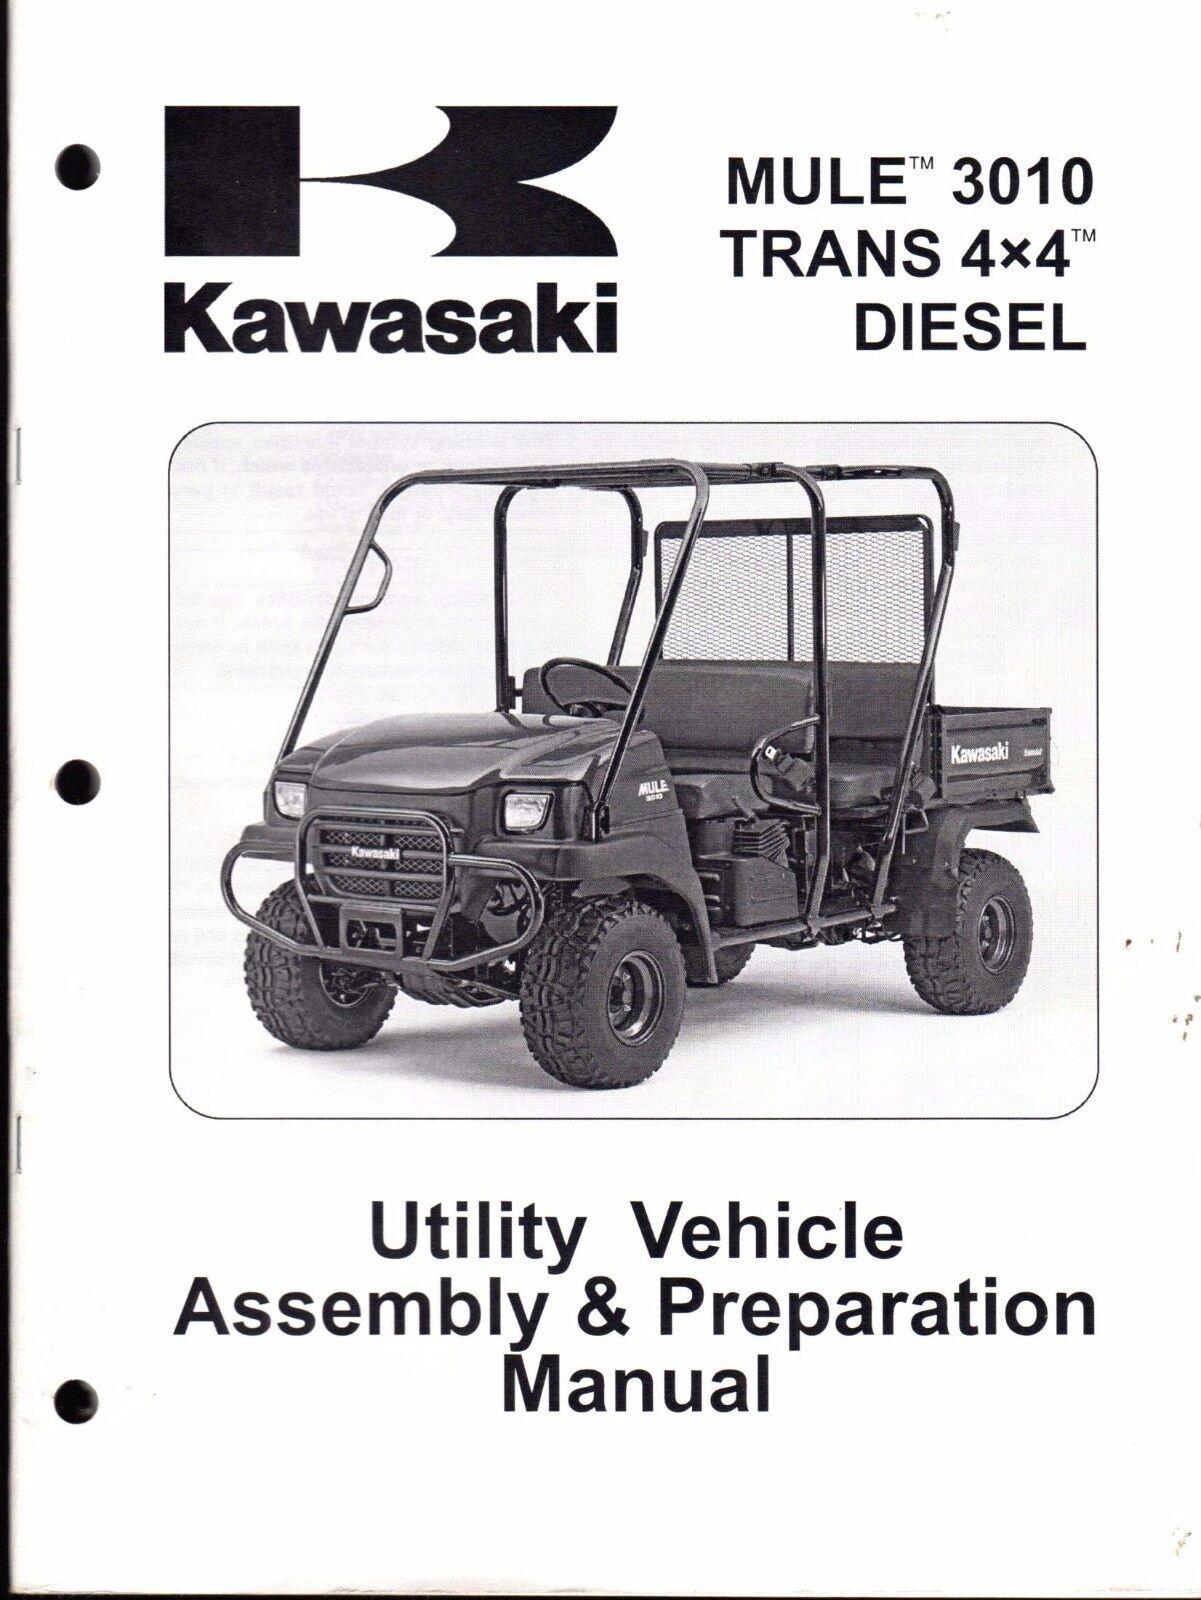 kawasaki mule 3010 trans 4x4 diesel 2007 manual ebay rh ebay com Kawasaki Mule 2510 Kawasaki Mule 2520